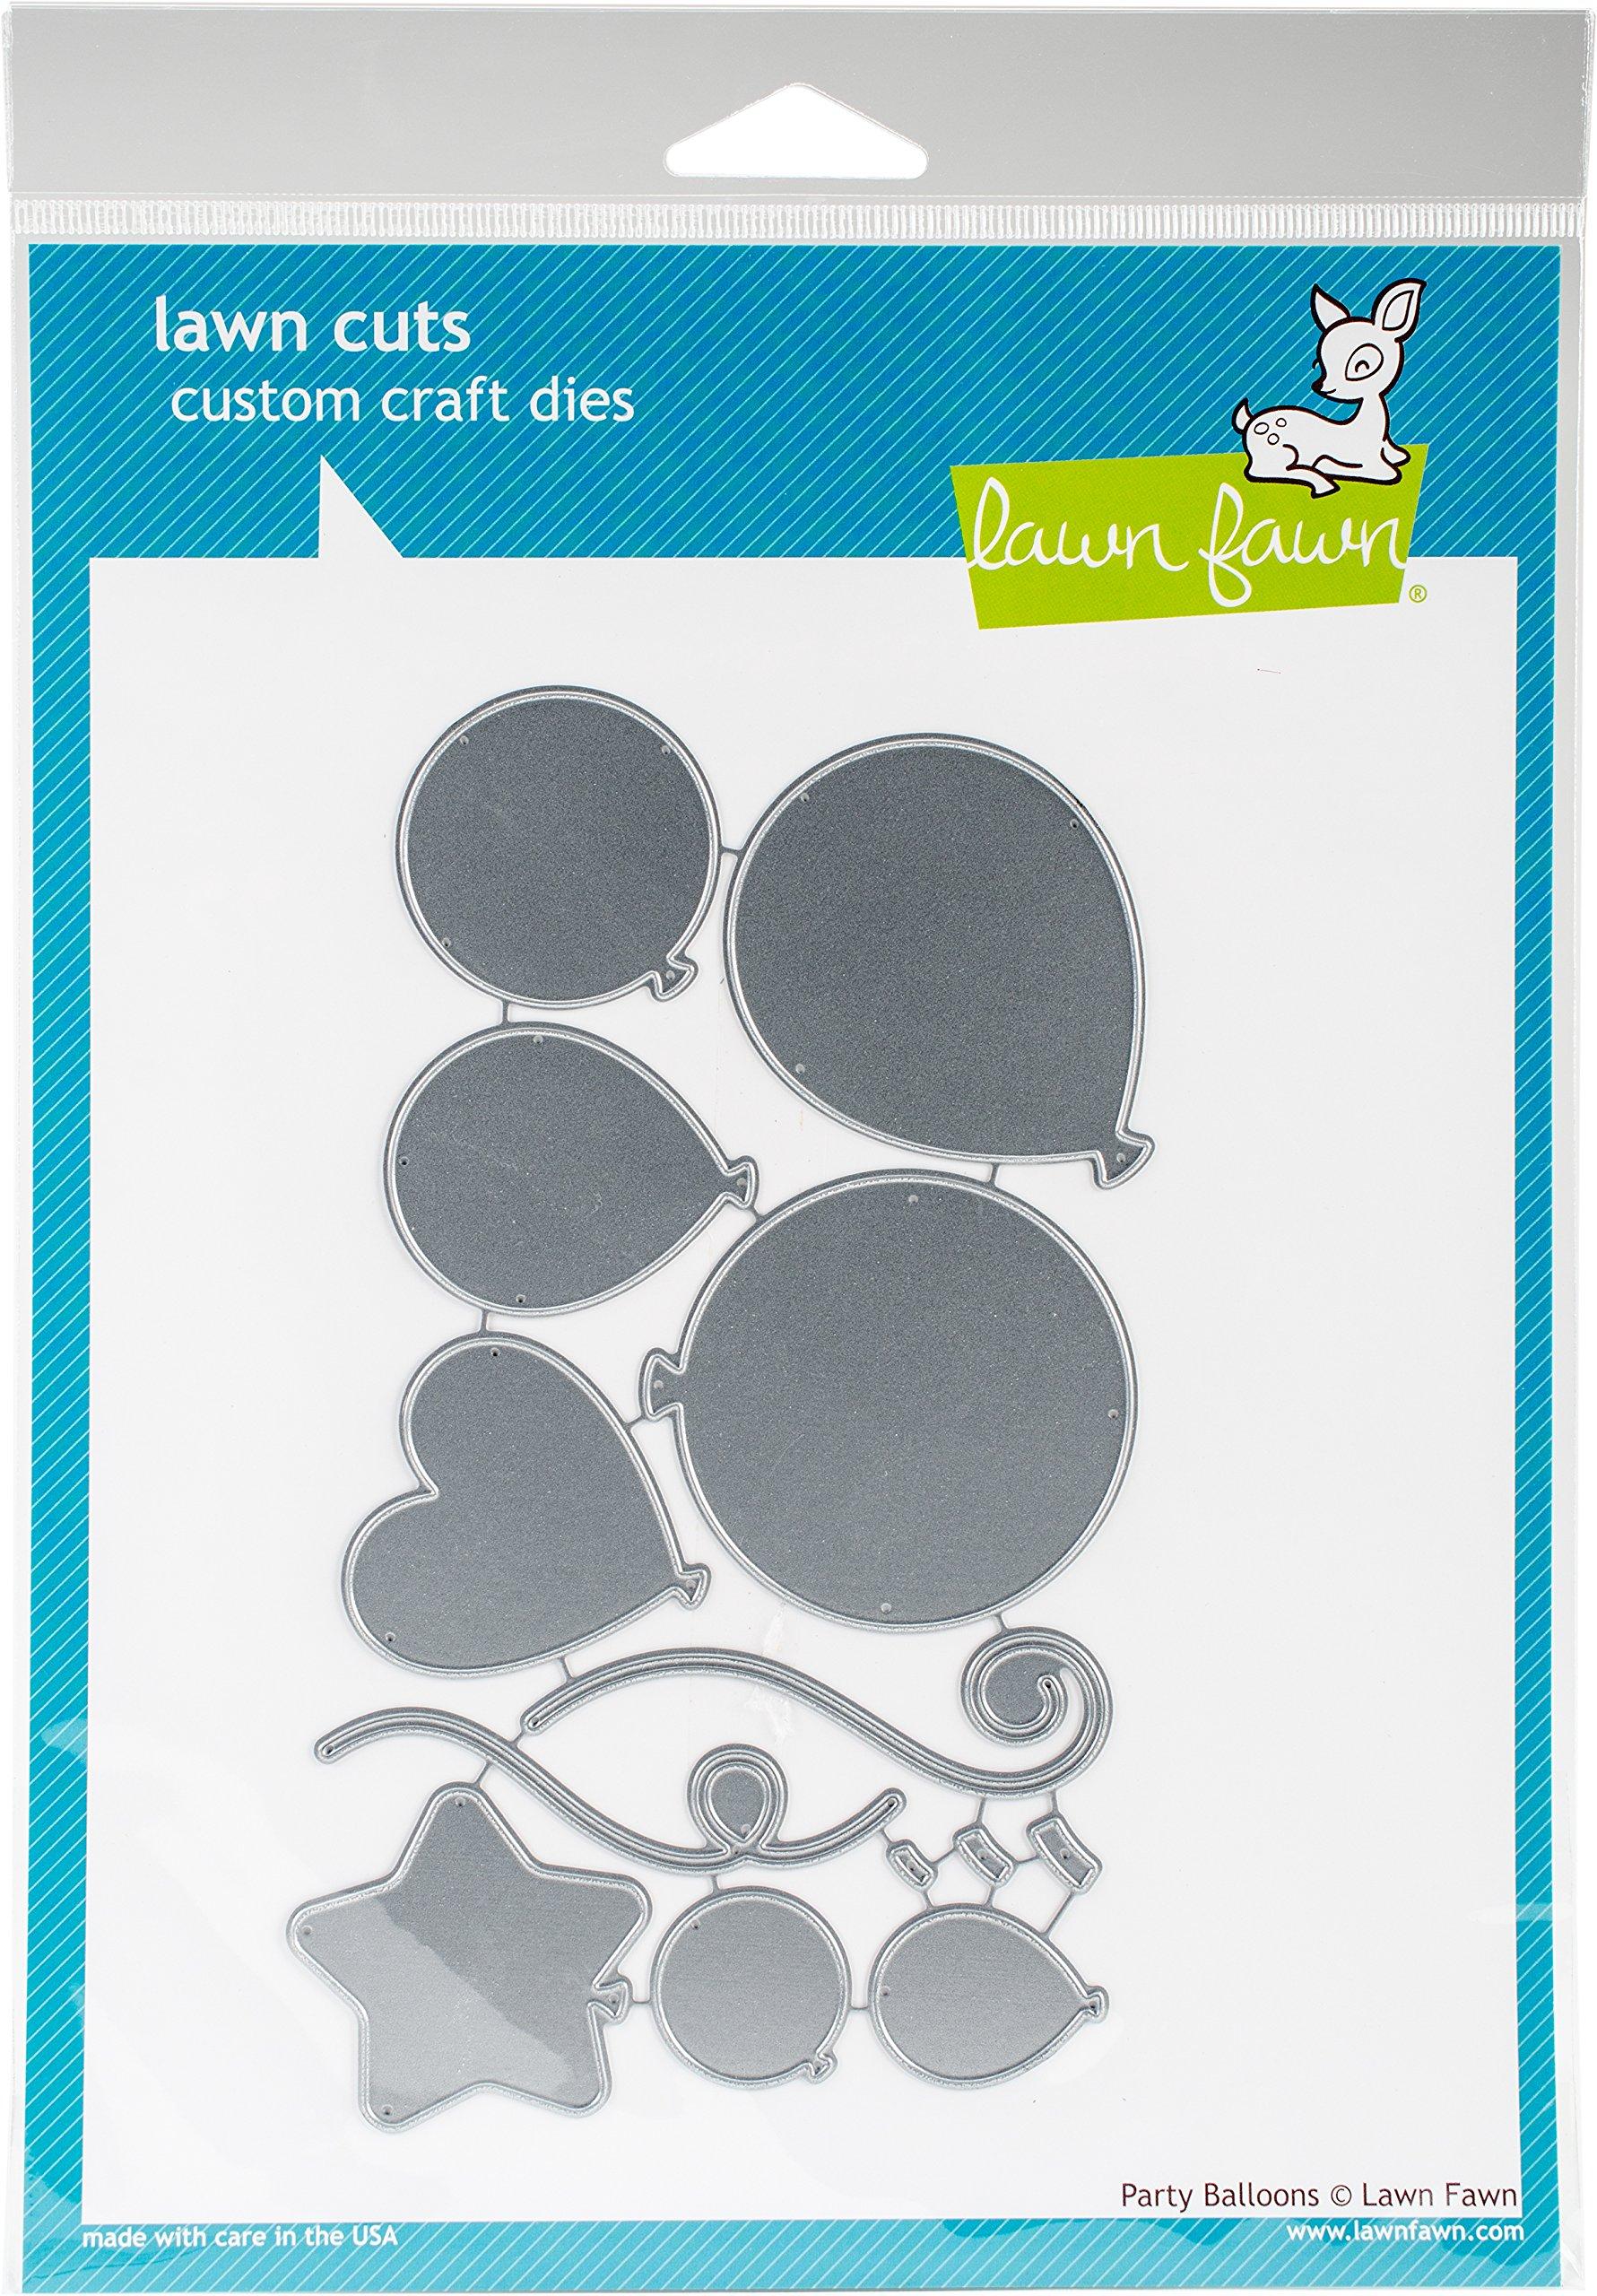 Lawn Fawn Cuts Party Balloons Universal Custom Craft Cutting Dies Lf856